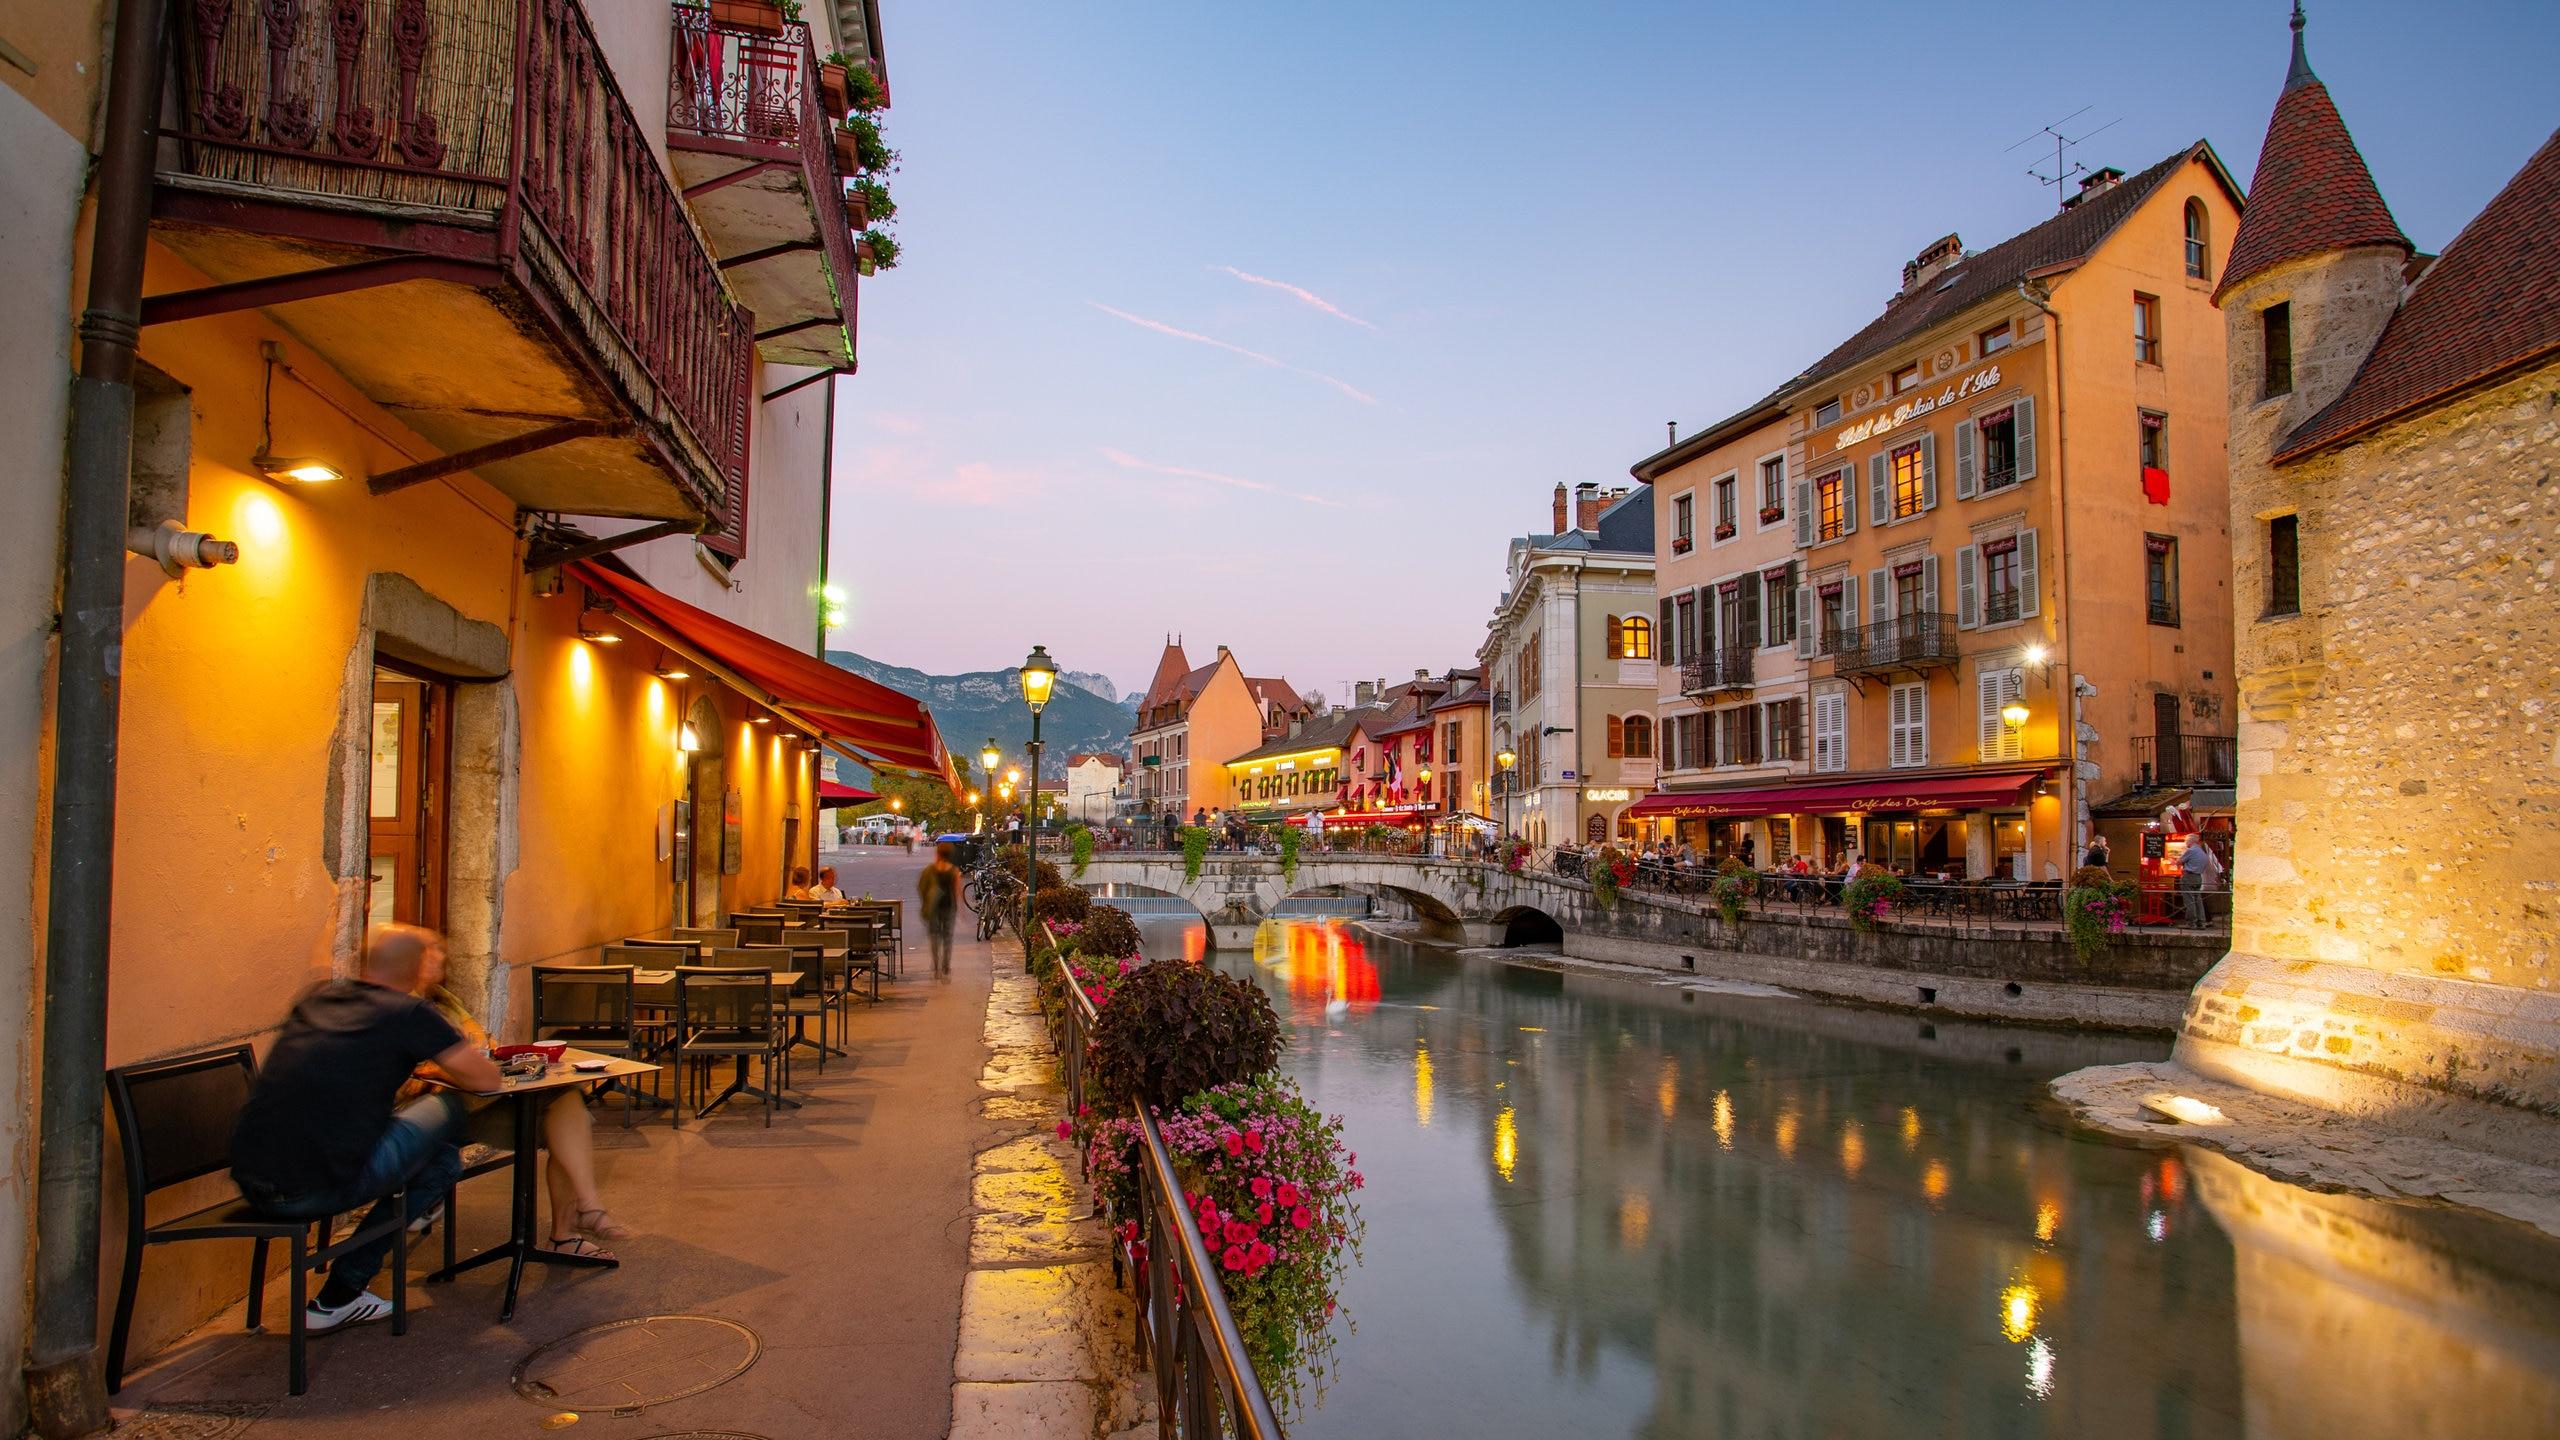 Haute-Savoie (departement), Frankrike